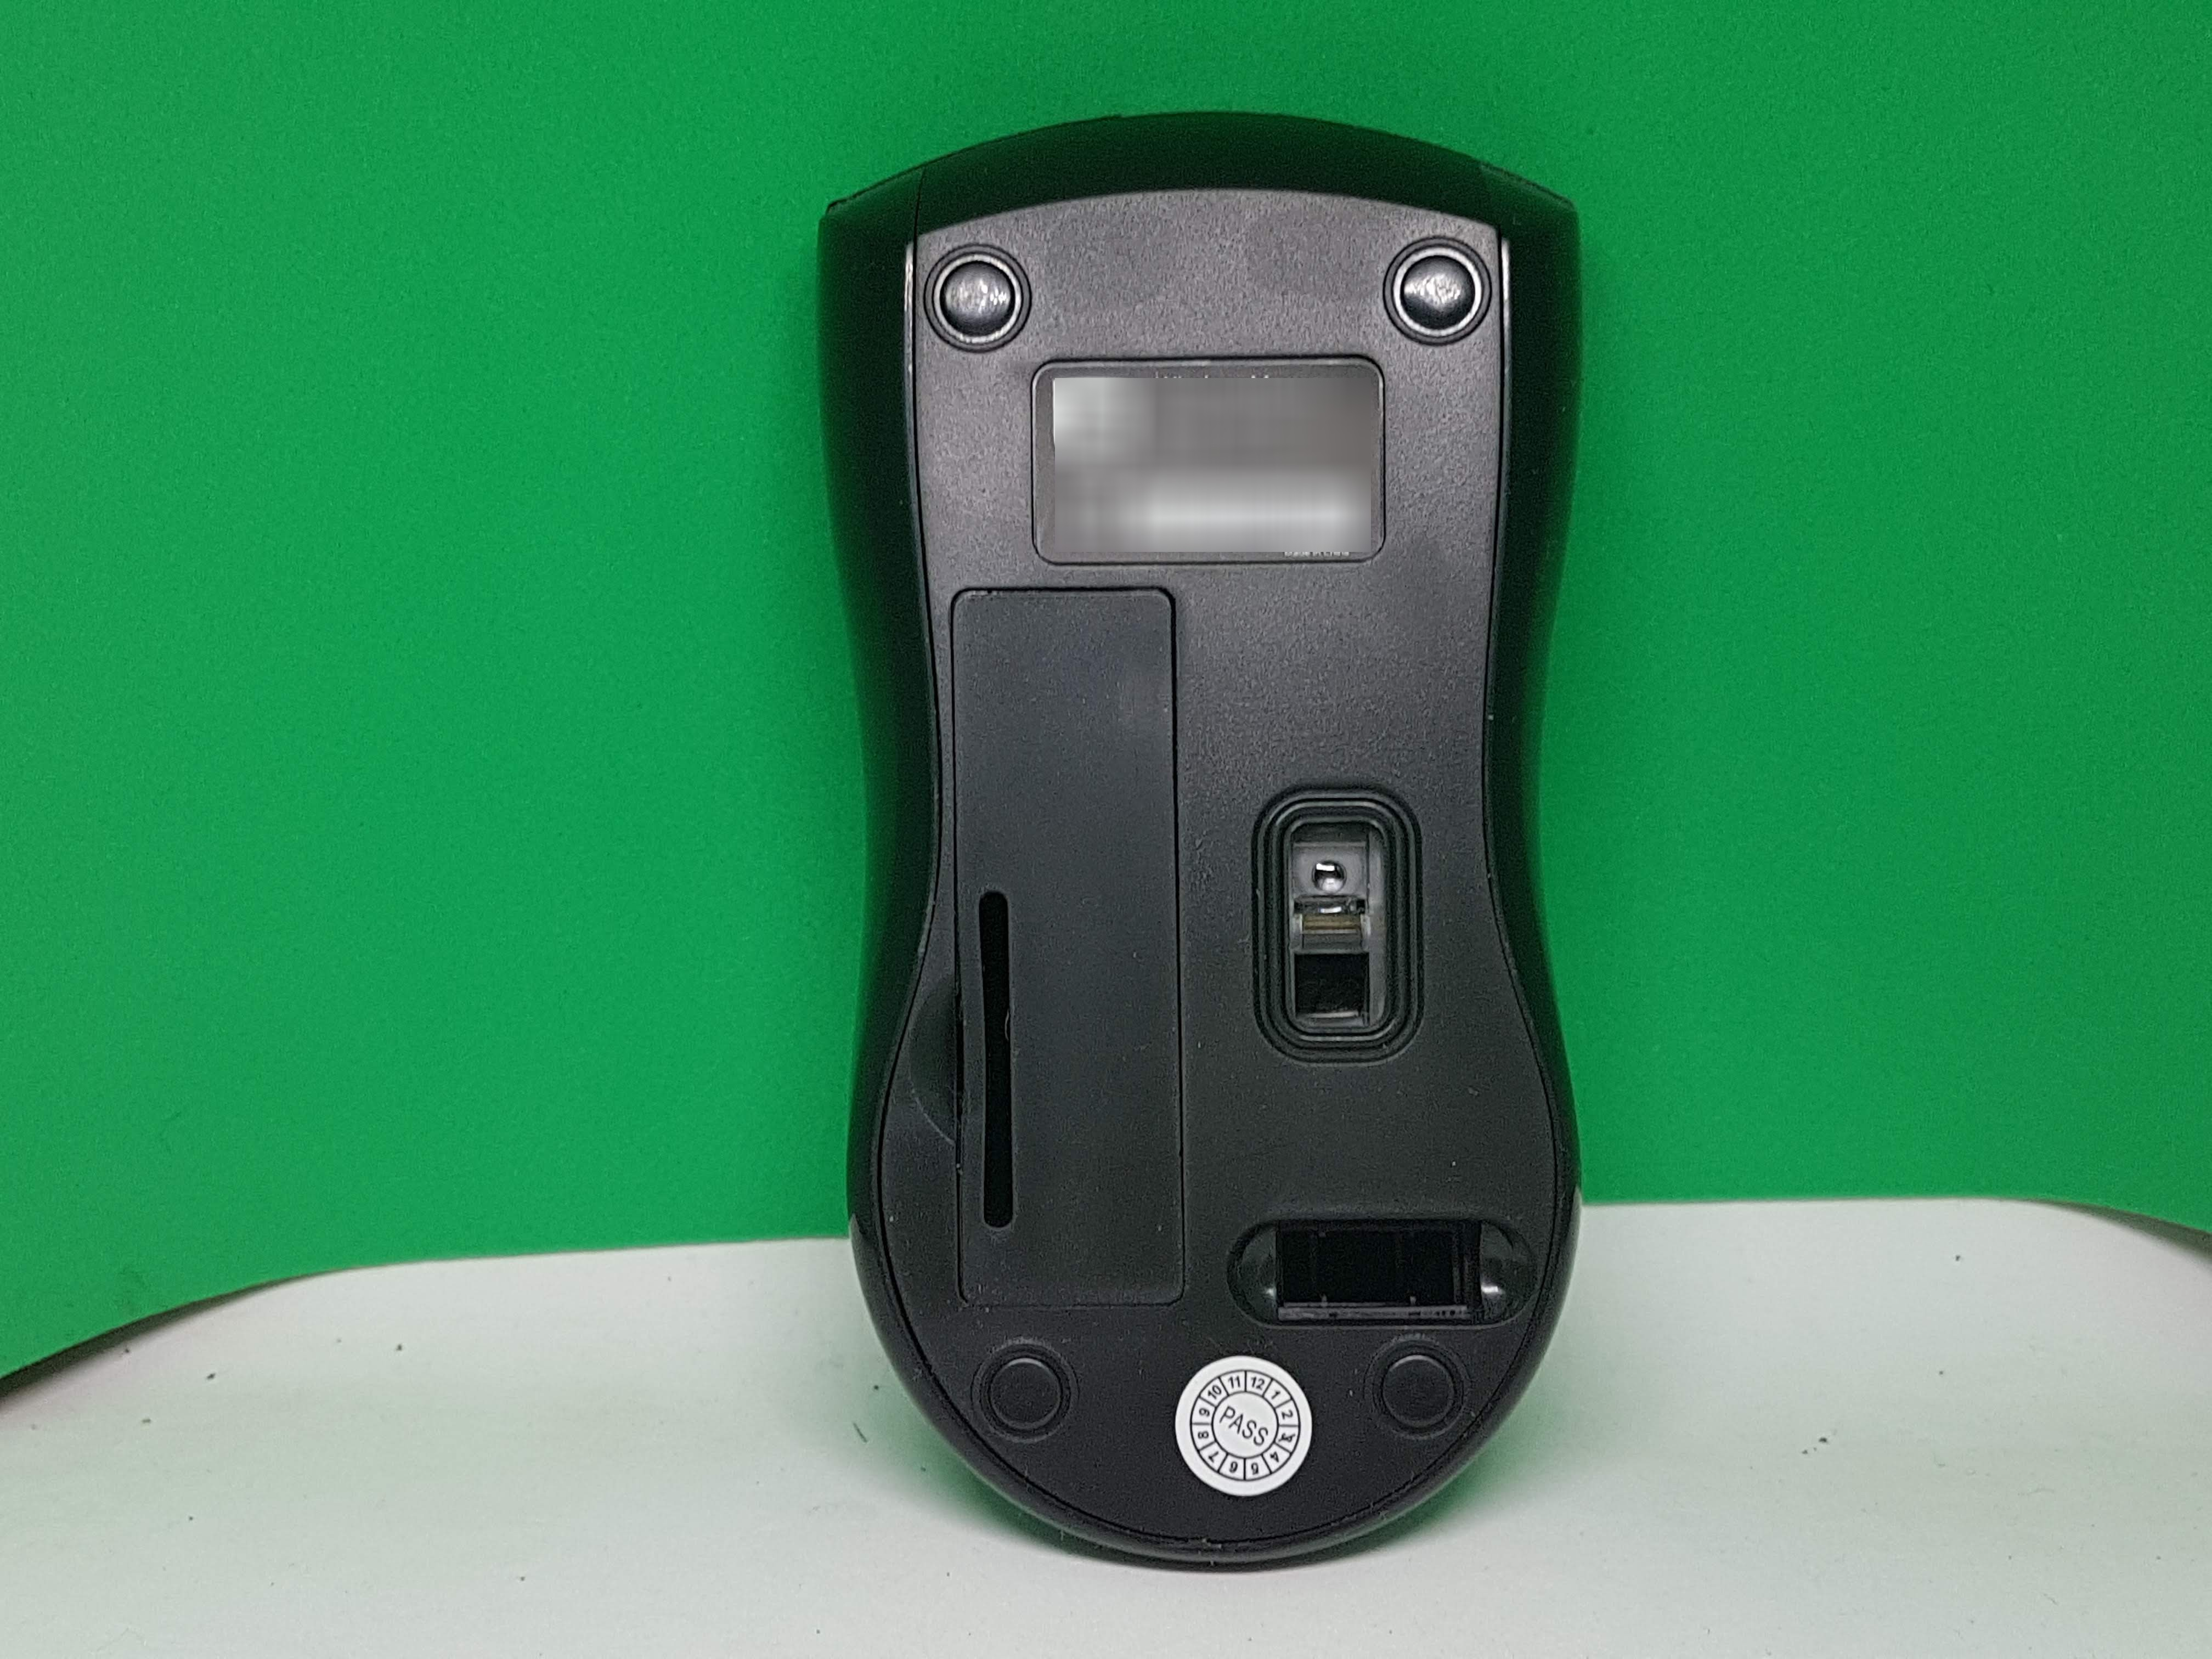 Philips-Souris-M200 - Souris-Philips-M200-14.jpg